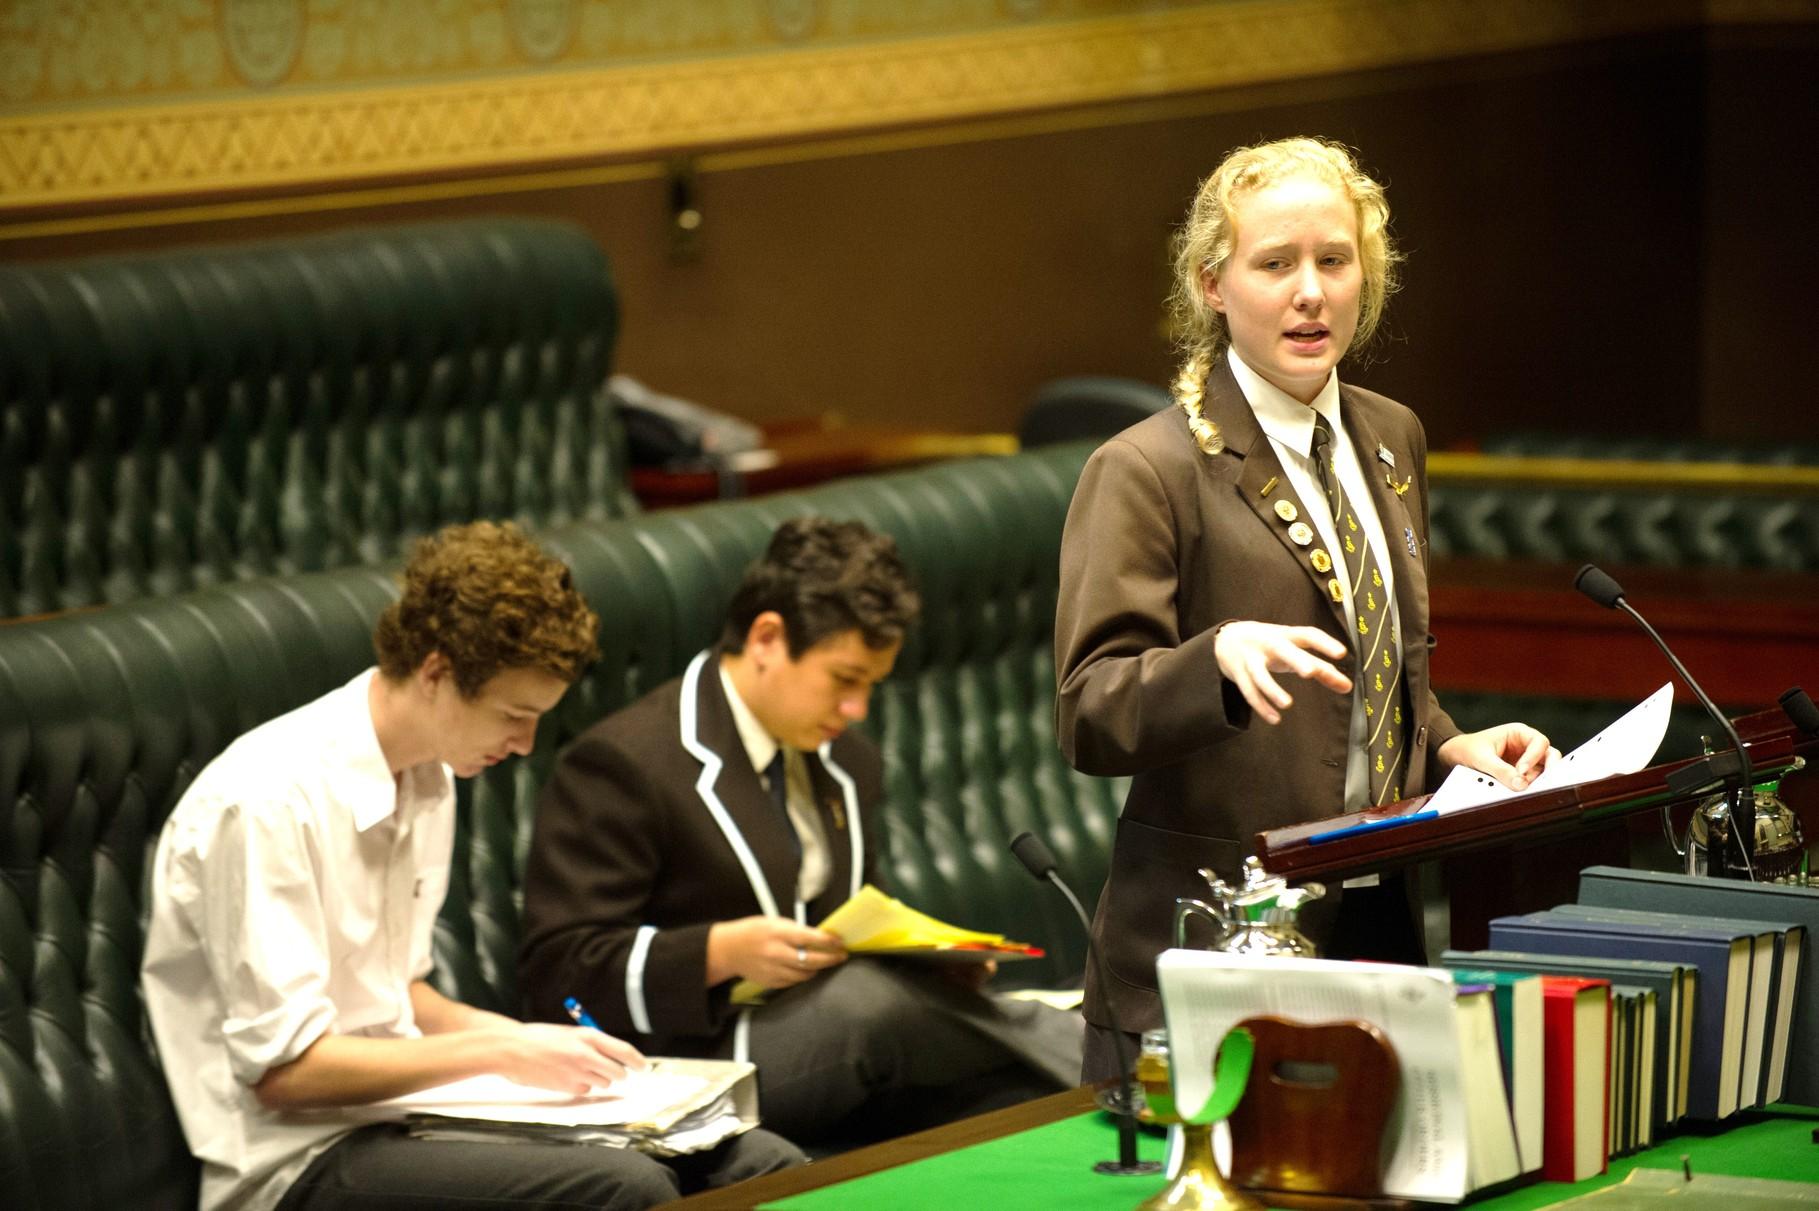 Sydney Girls High School put forward the case to the affirmative